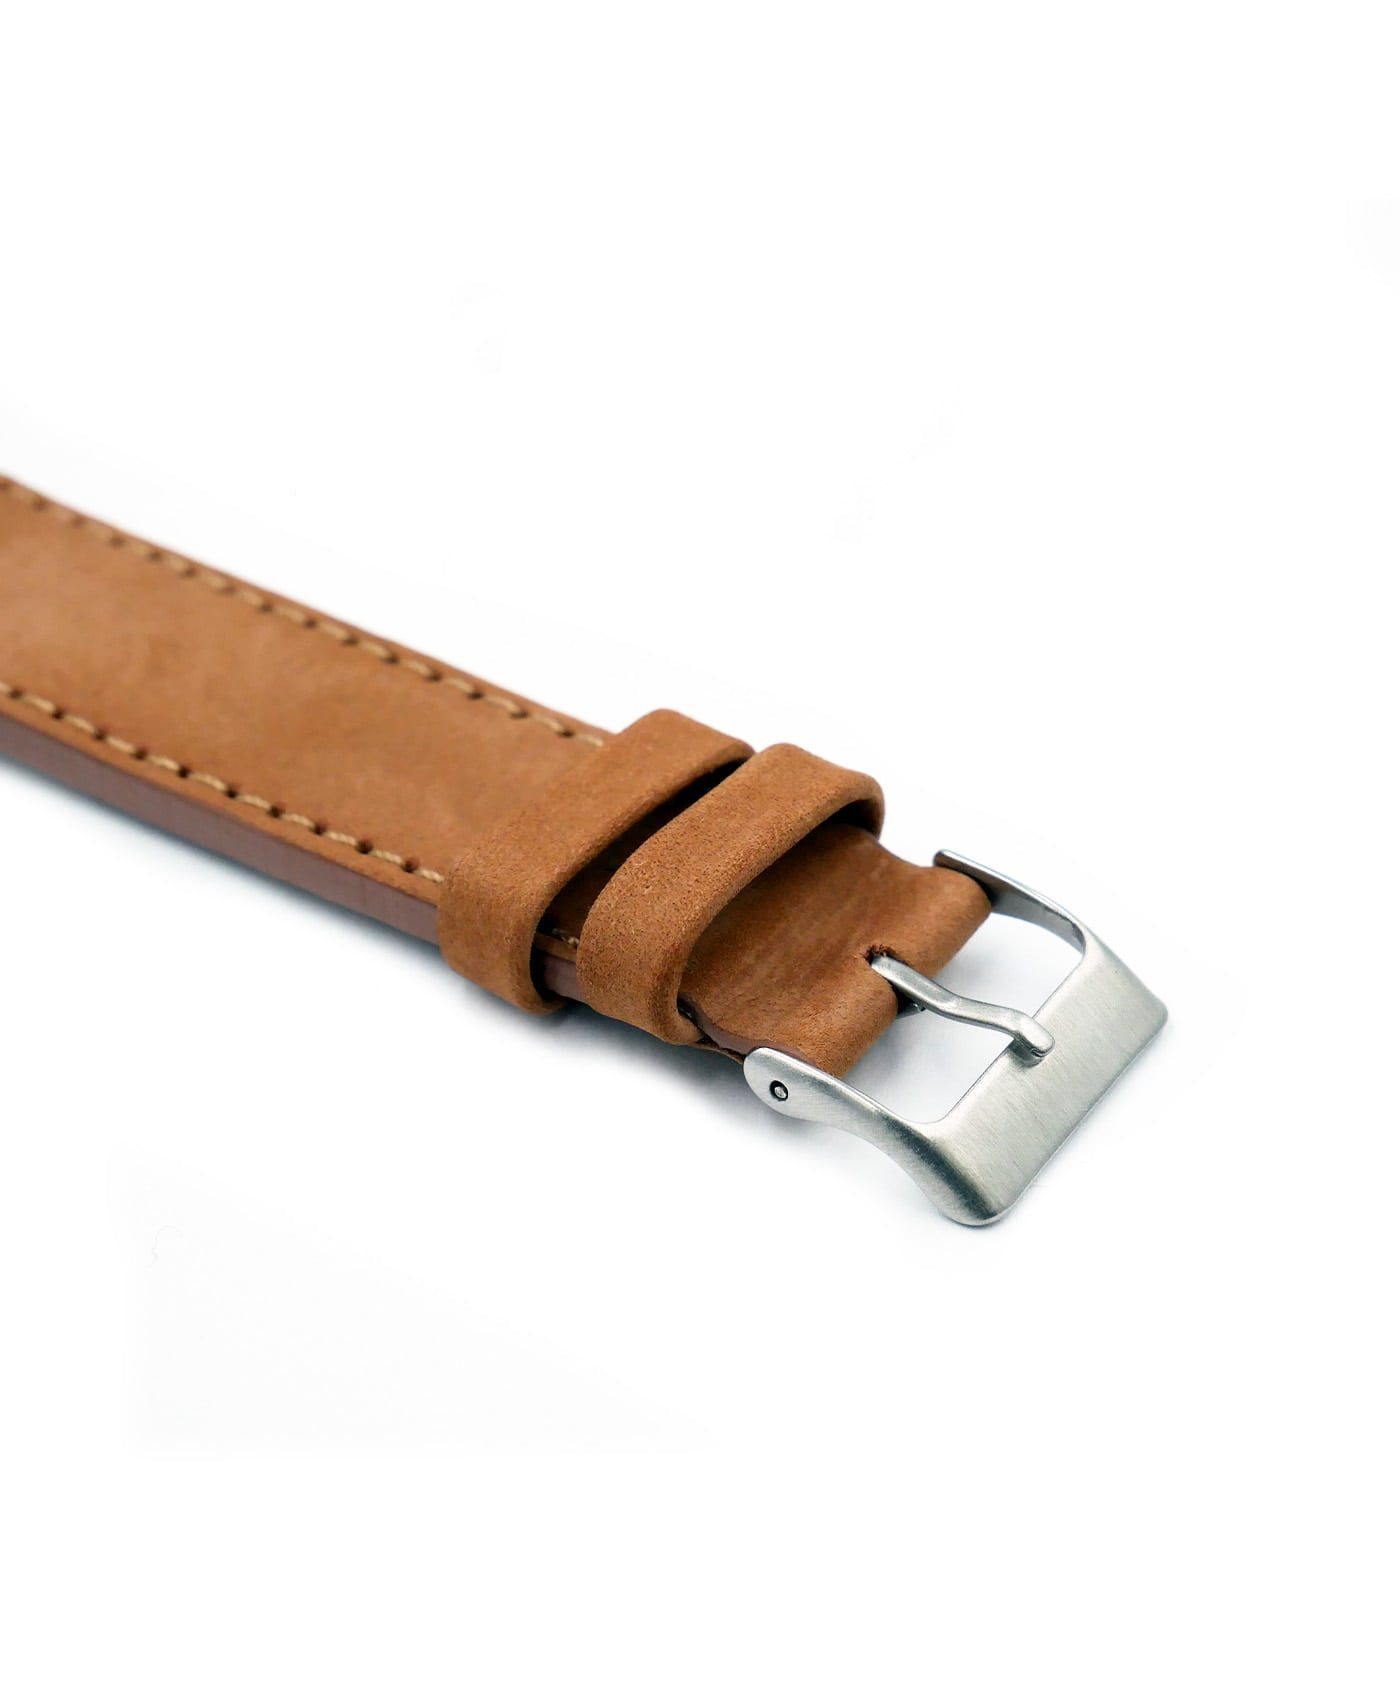 Pebro Premium Calfskin Watch Strap Terracotta Tanned No 190 buckle close up